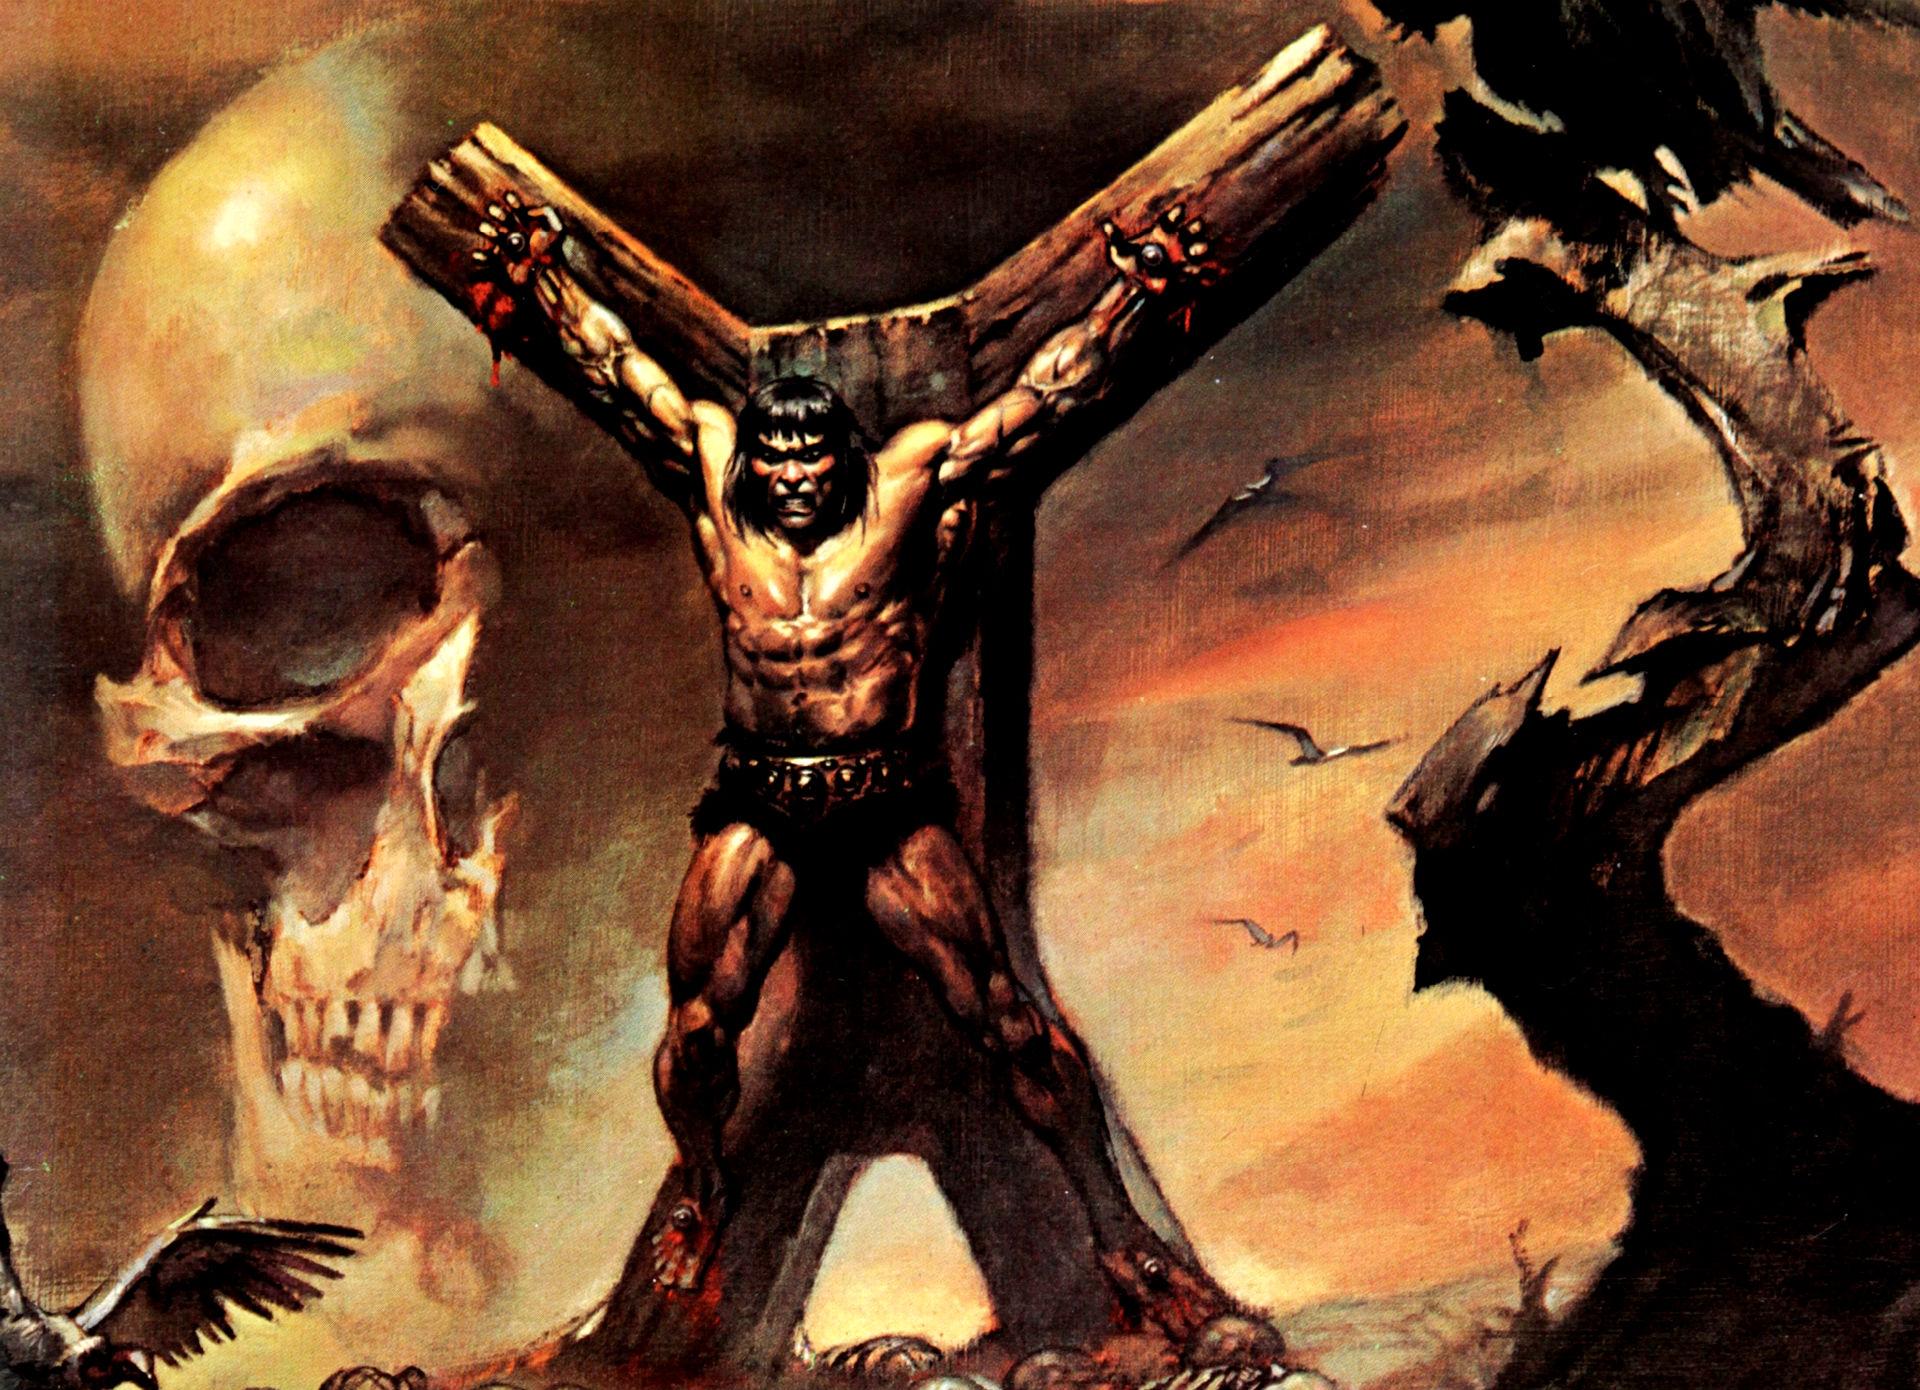 Conan The Barbarian Art Wallpaper Conan the barbarian g 1920x1390